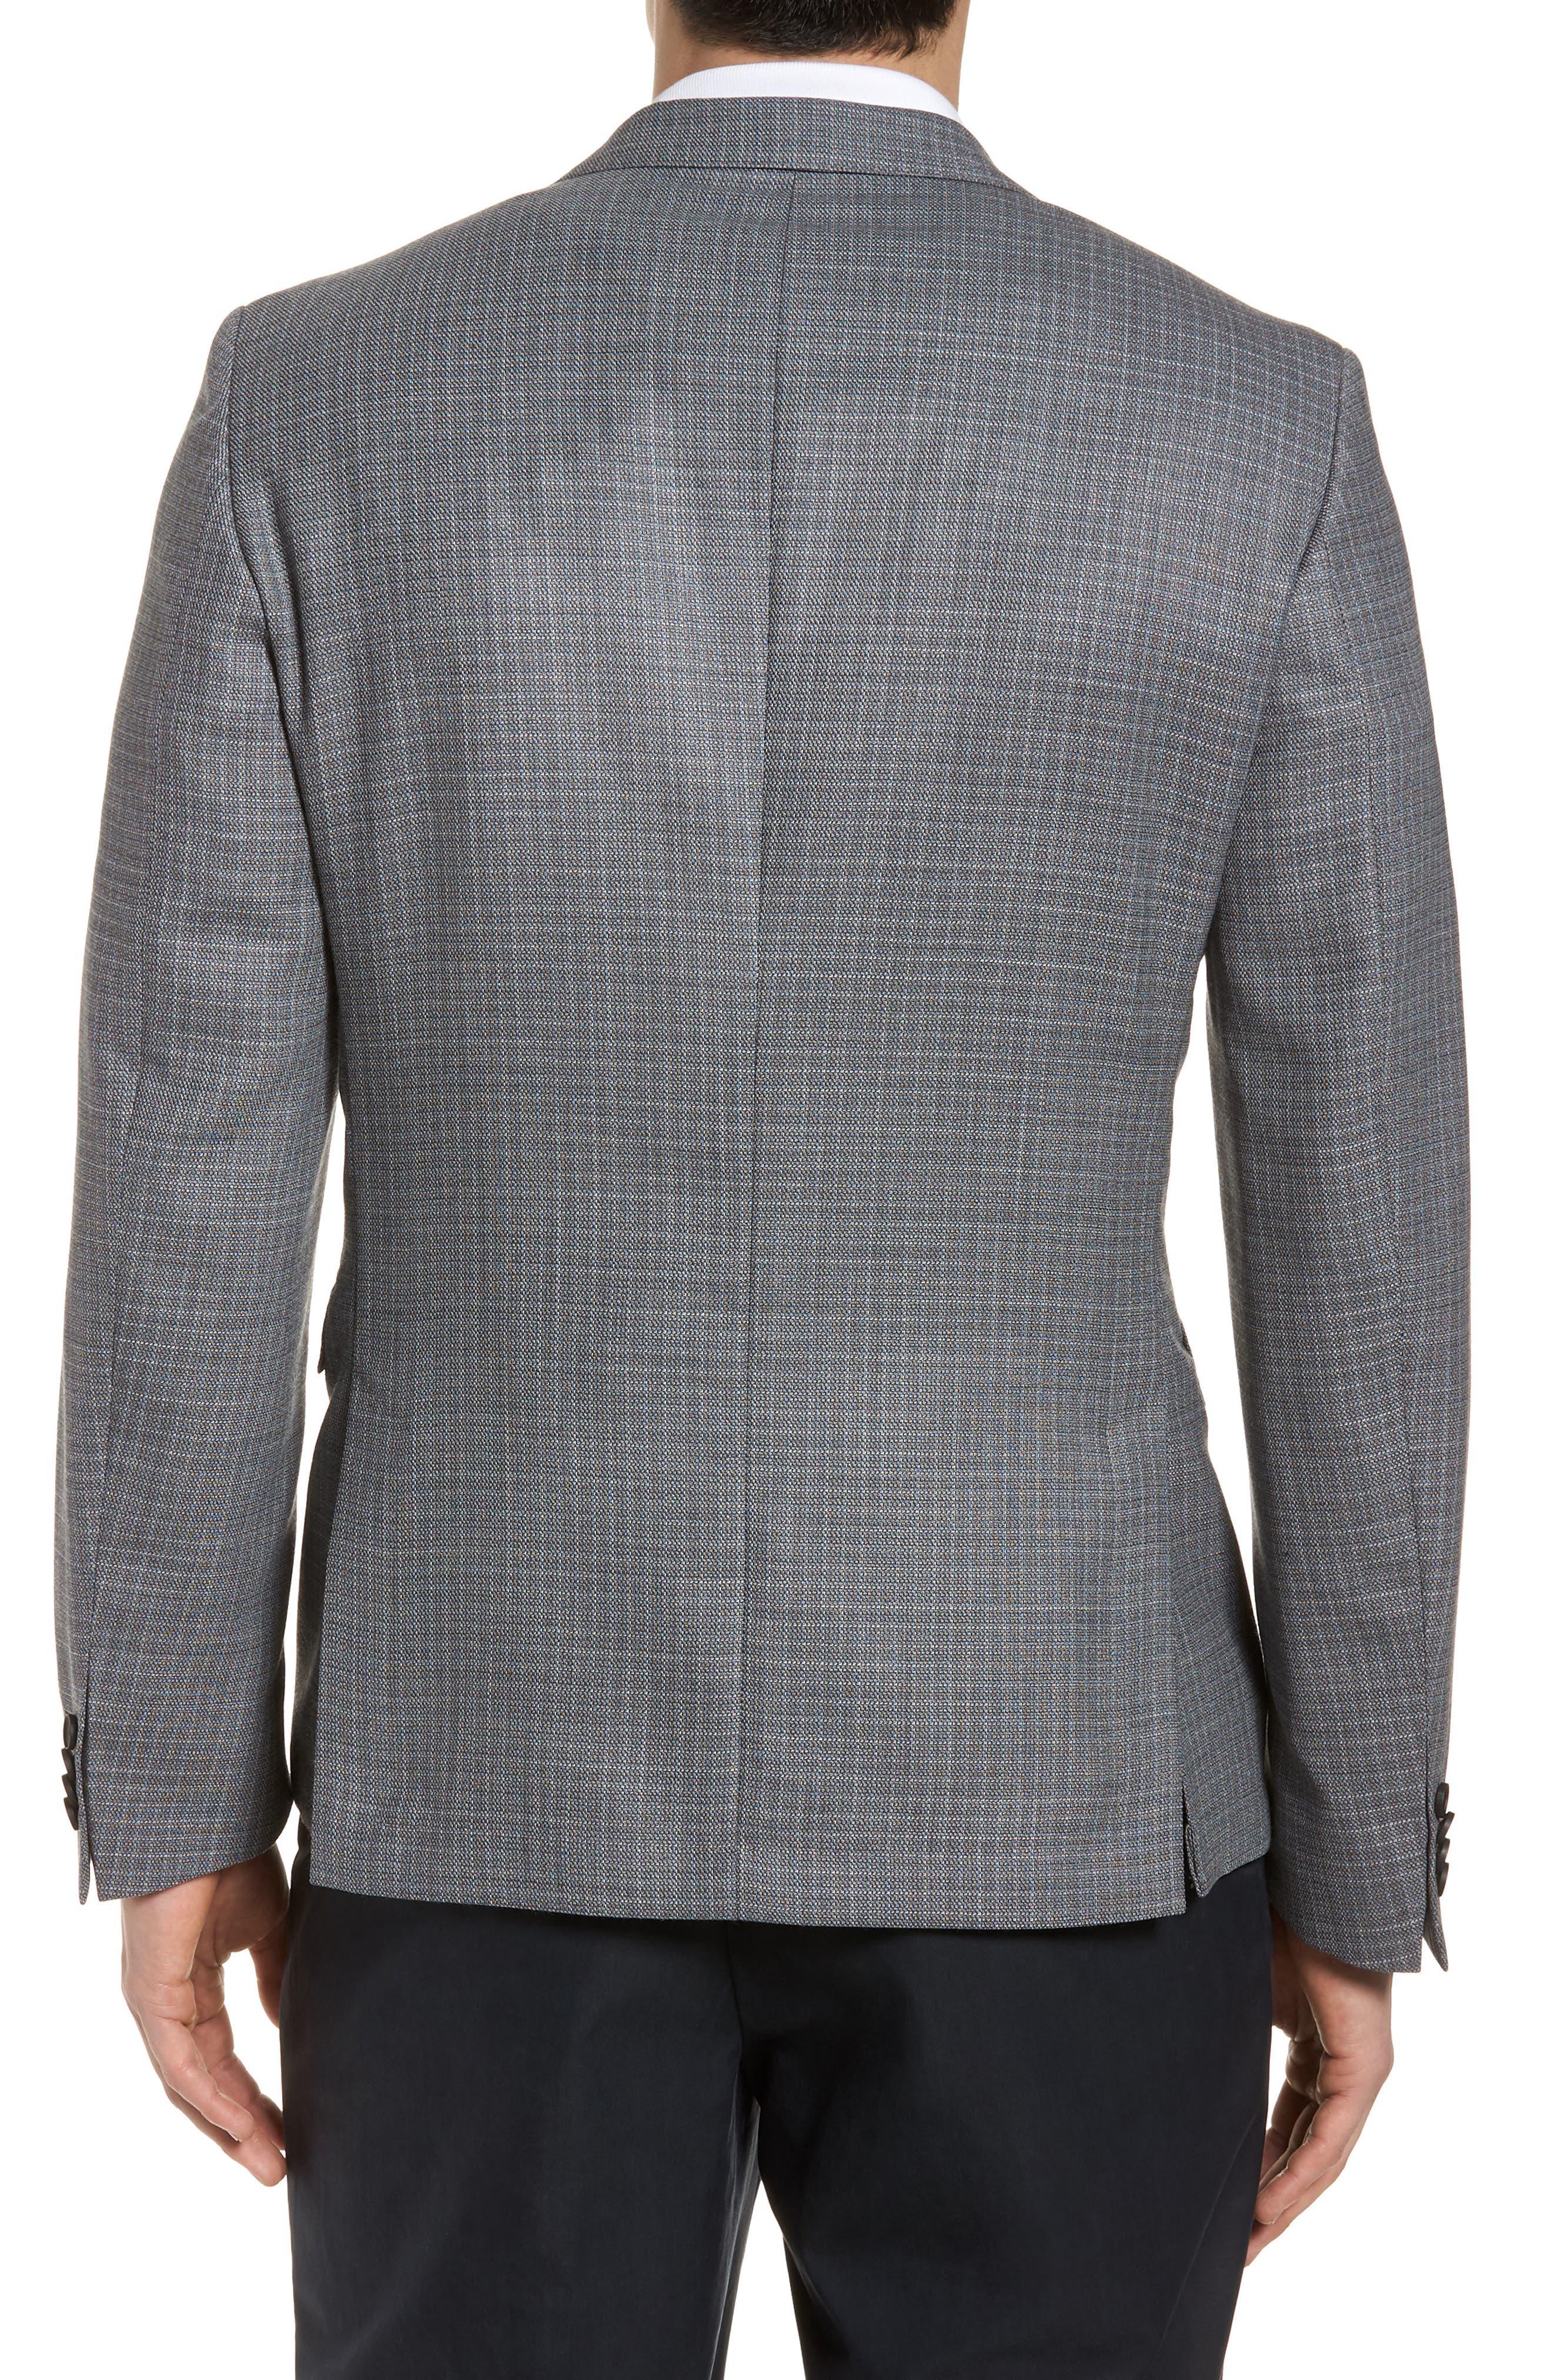 Nobis Trim Fit Wool Sport Coat,                             Alternate thumbnail 2, color,                             Medium Grey